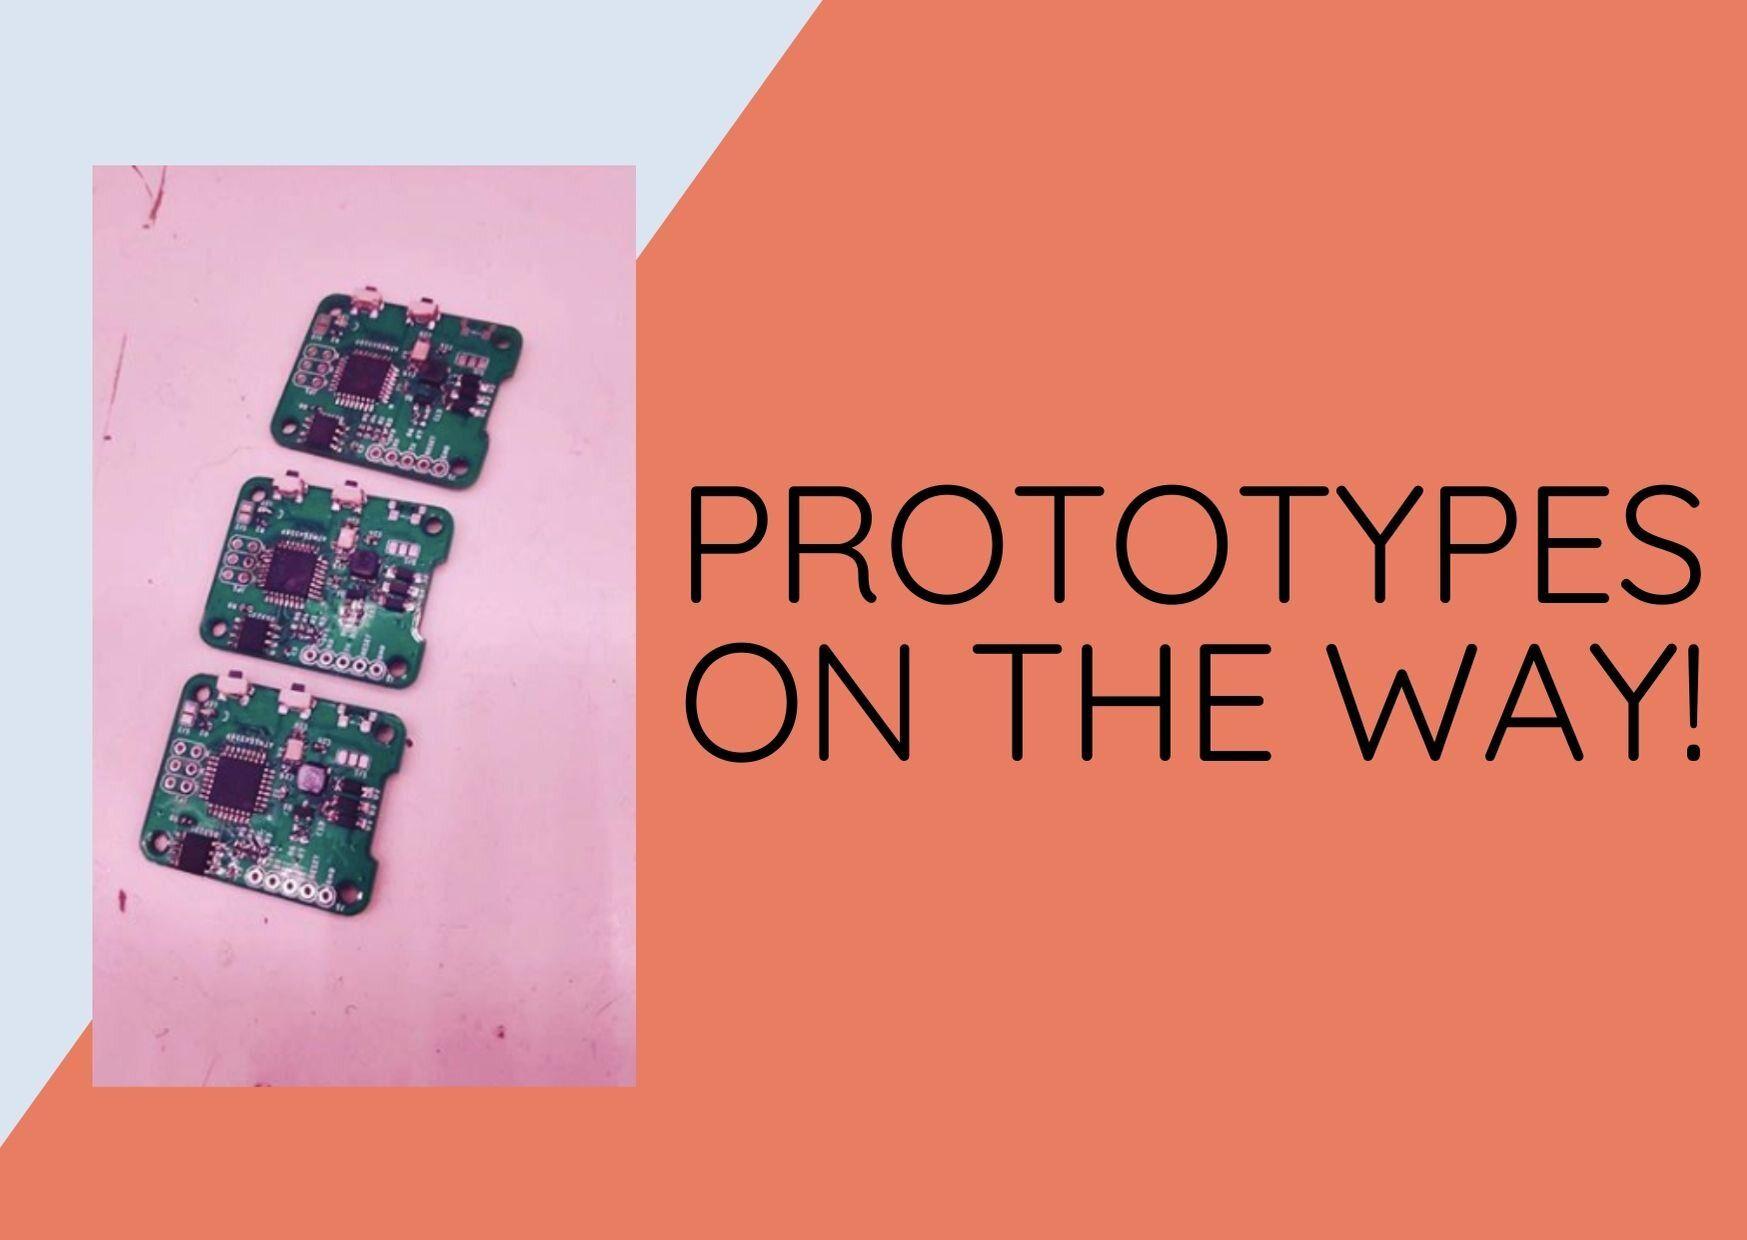 Prototypes+on+the+way!.jpg